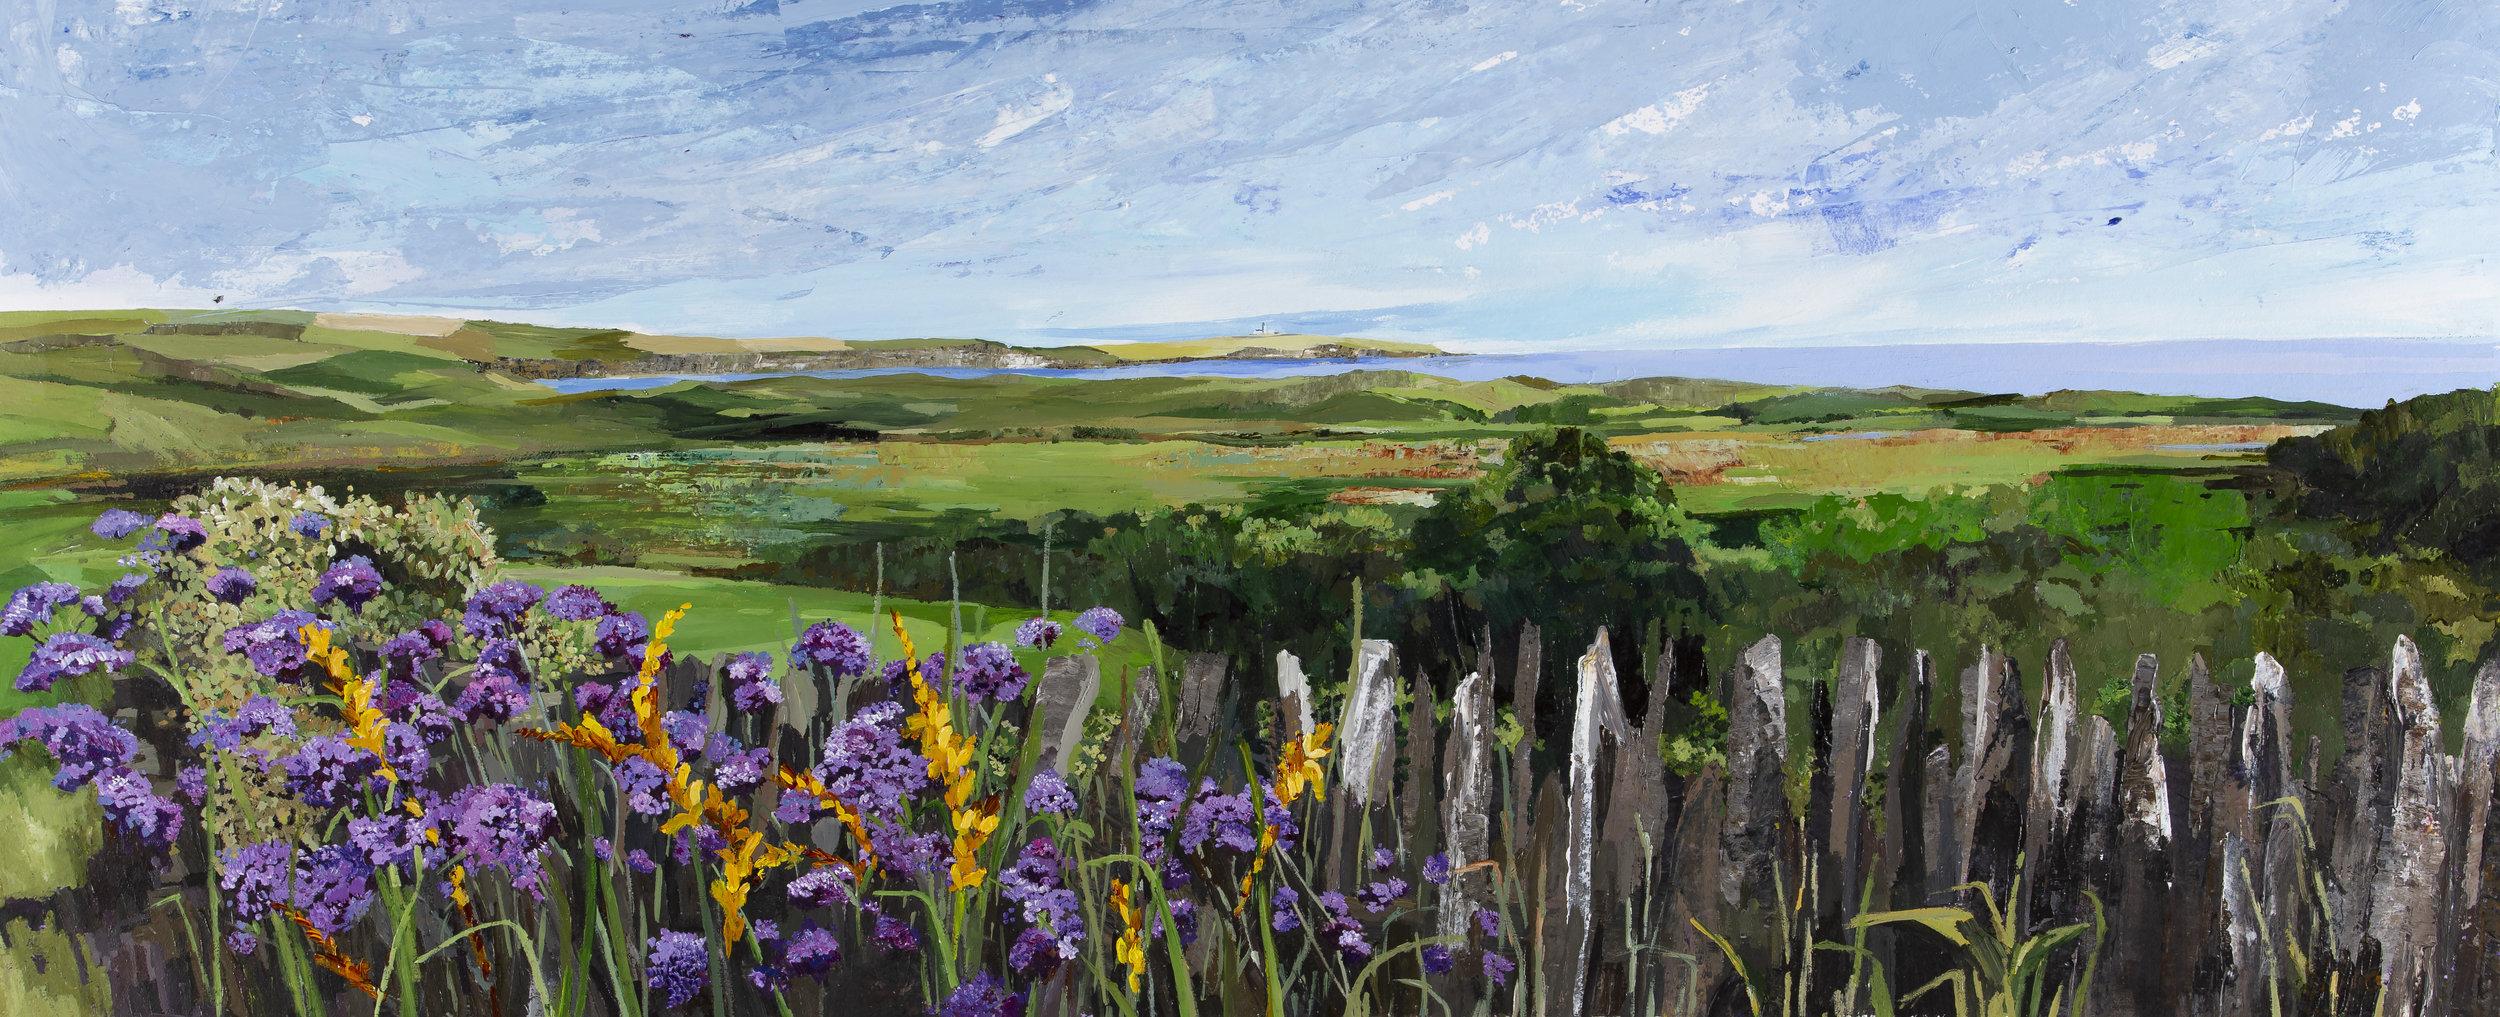 Castlefreke Farmyard View (1).jpg